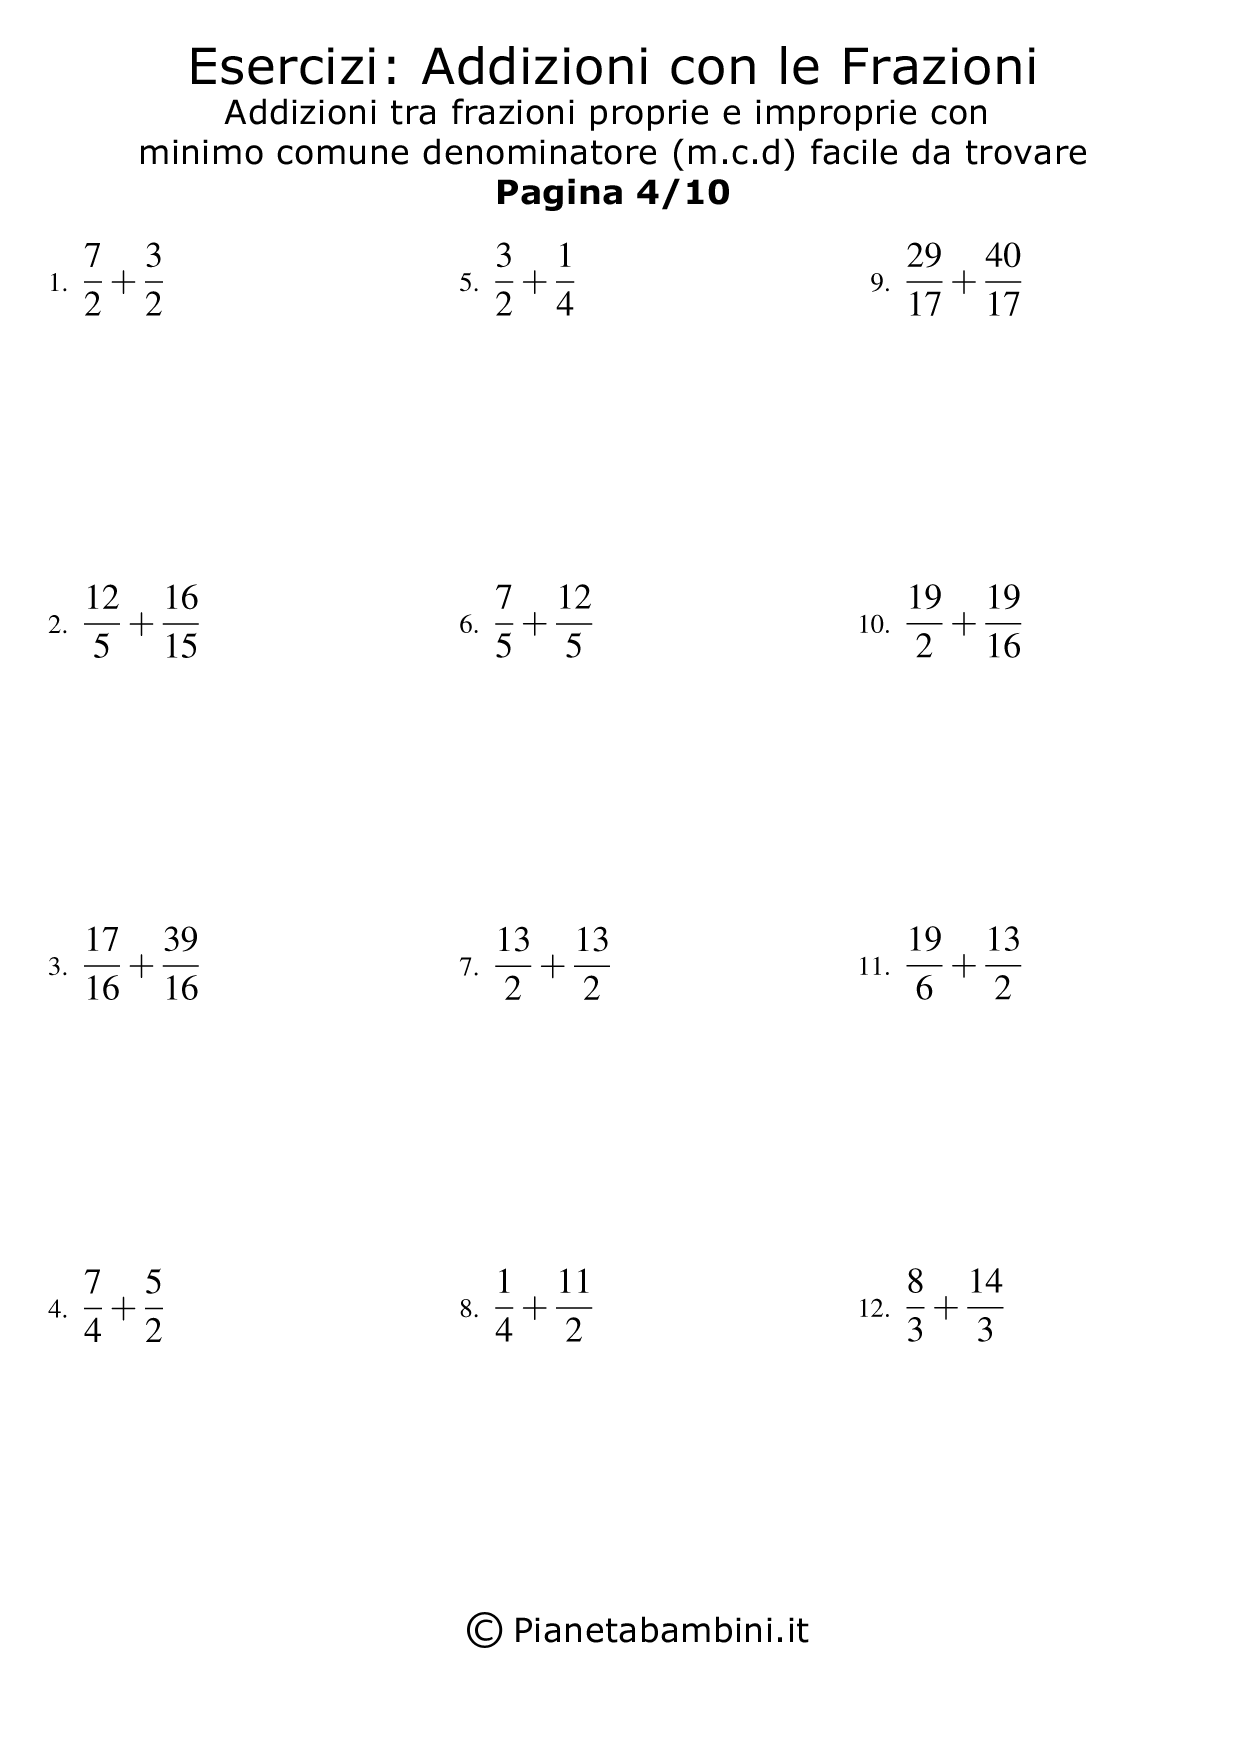 Frazioni-Prorpie-Improprie-m.c.d-Facile_04